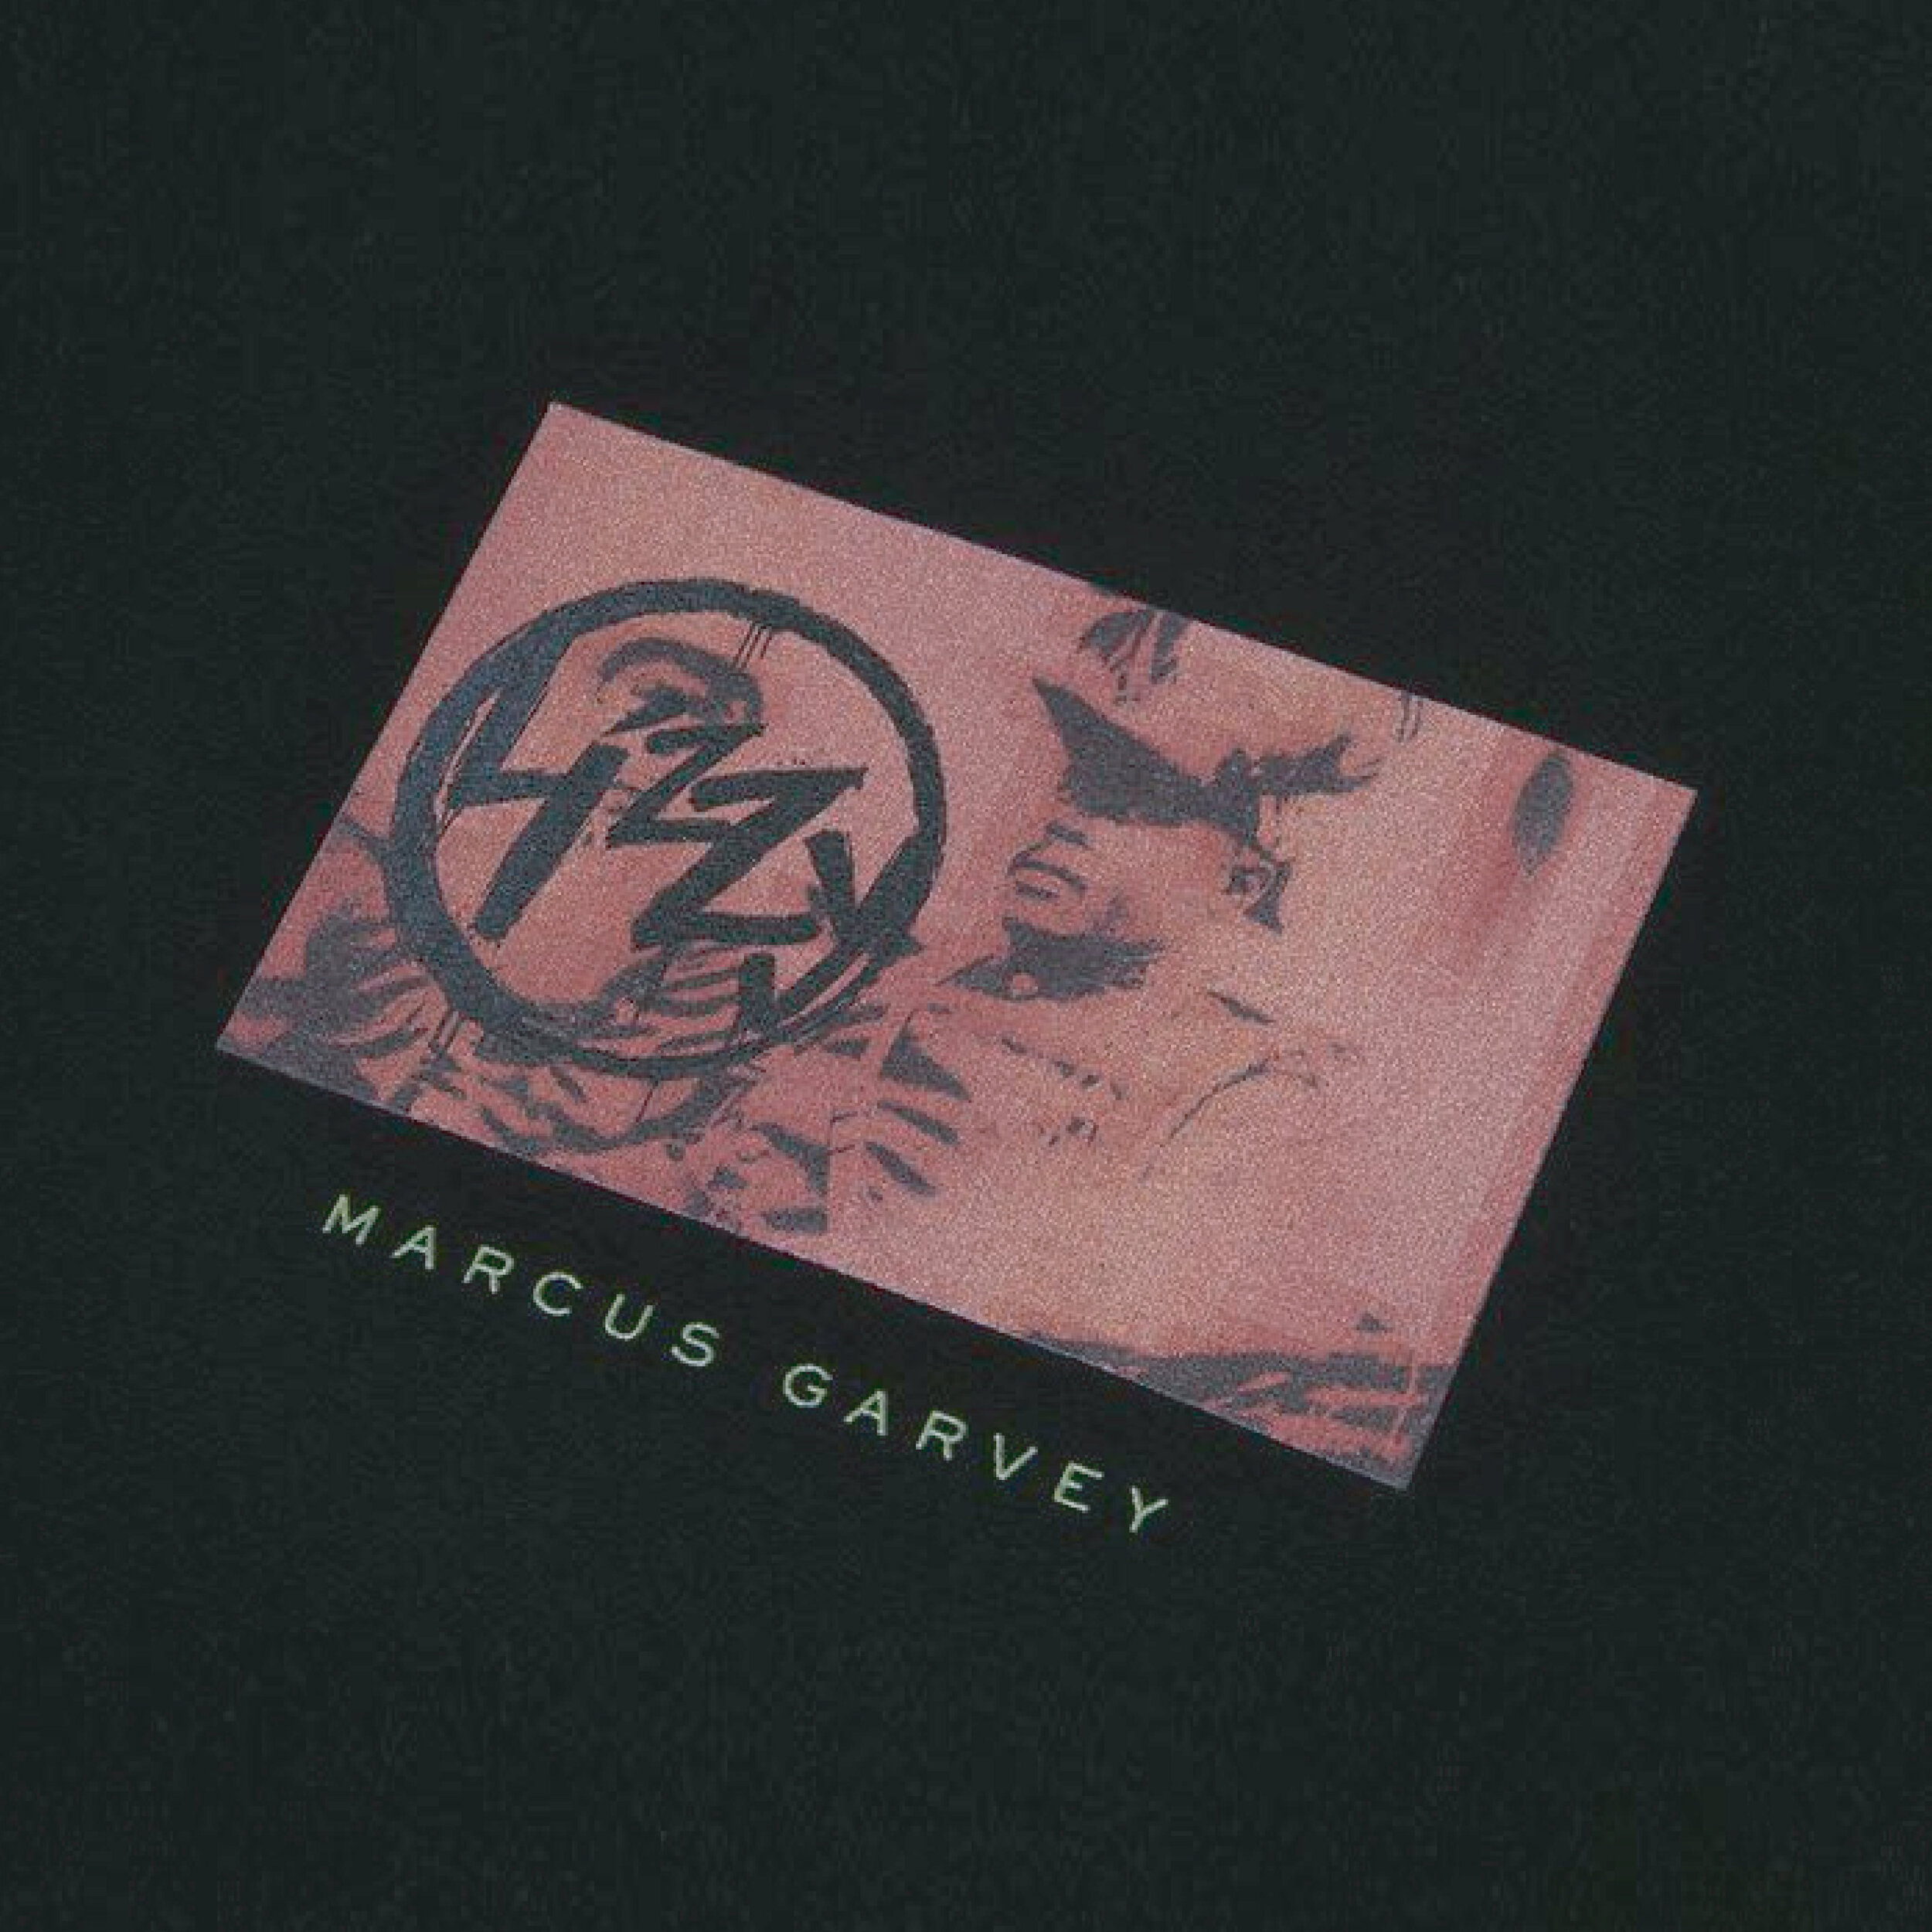 Marcus G.jpg